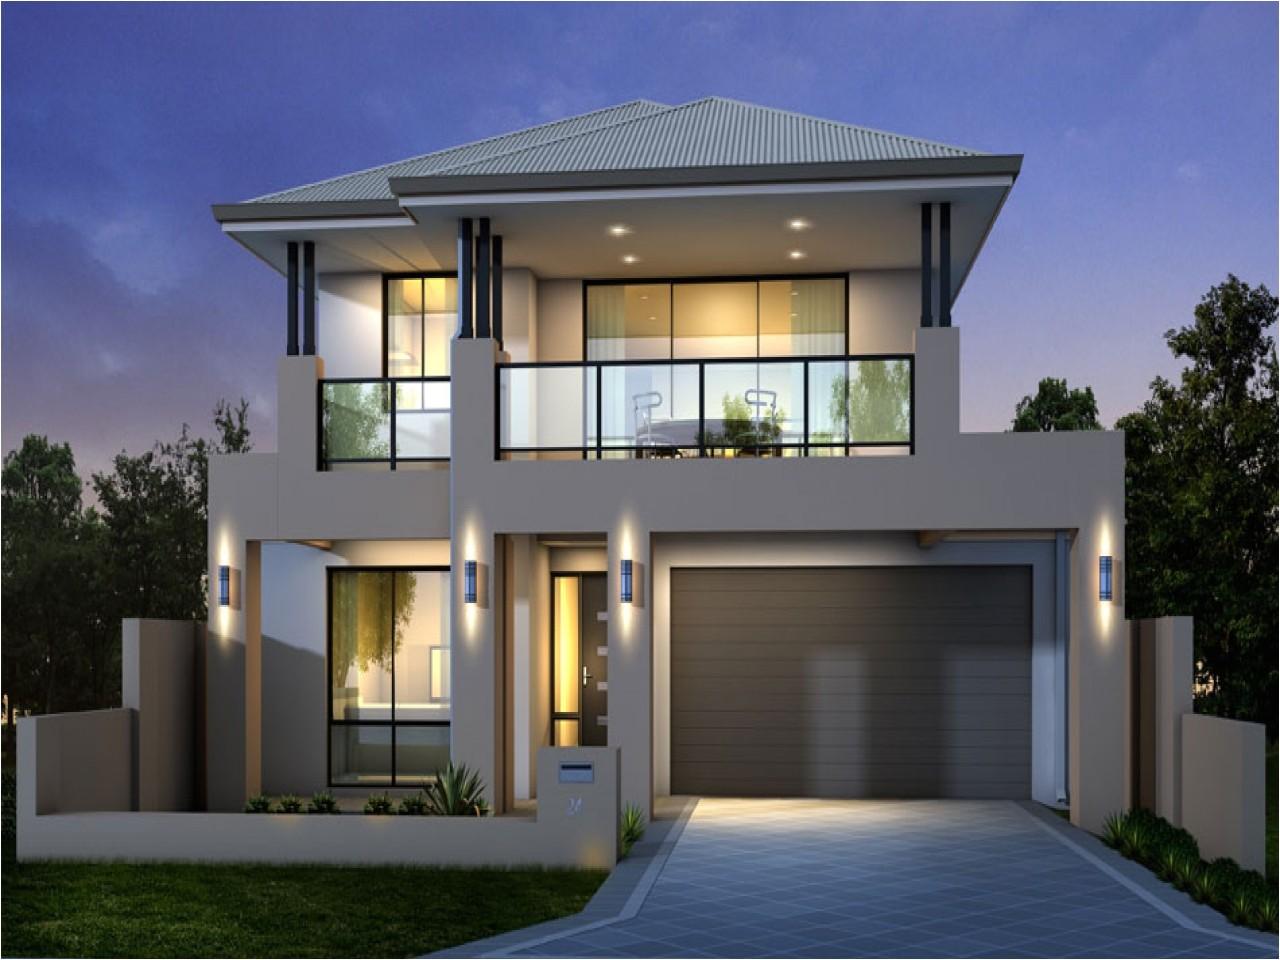 unique 2 storey modern house designs and floor plans